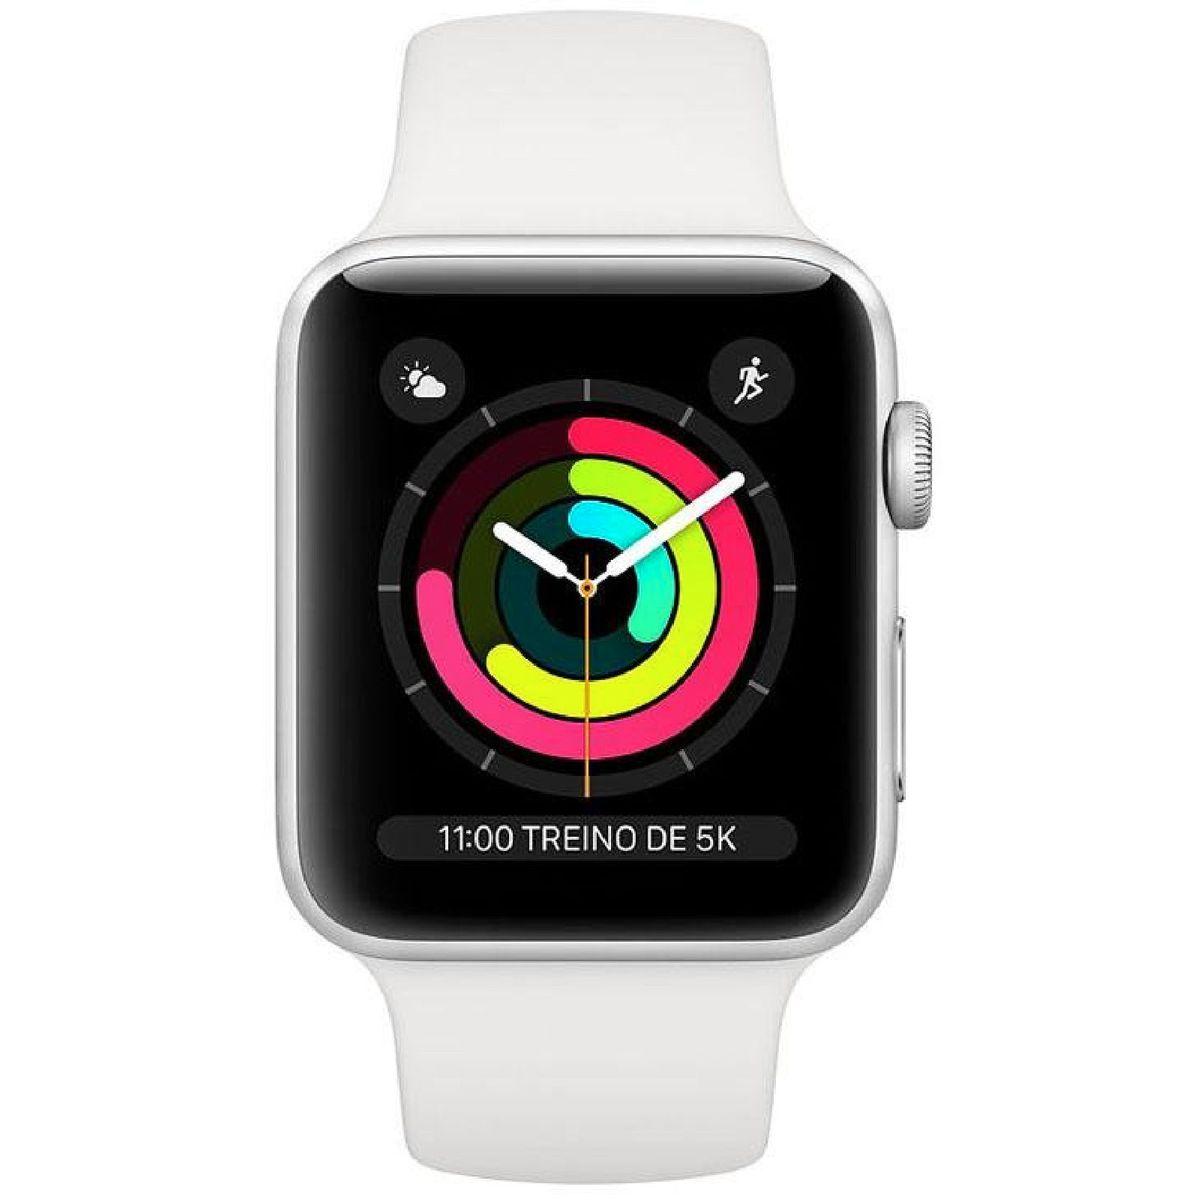 Apple Watch Series 4, Seminovo 44mm, Alumínio Prata